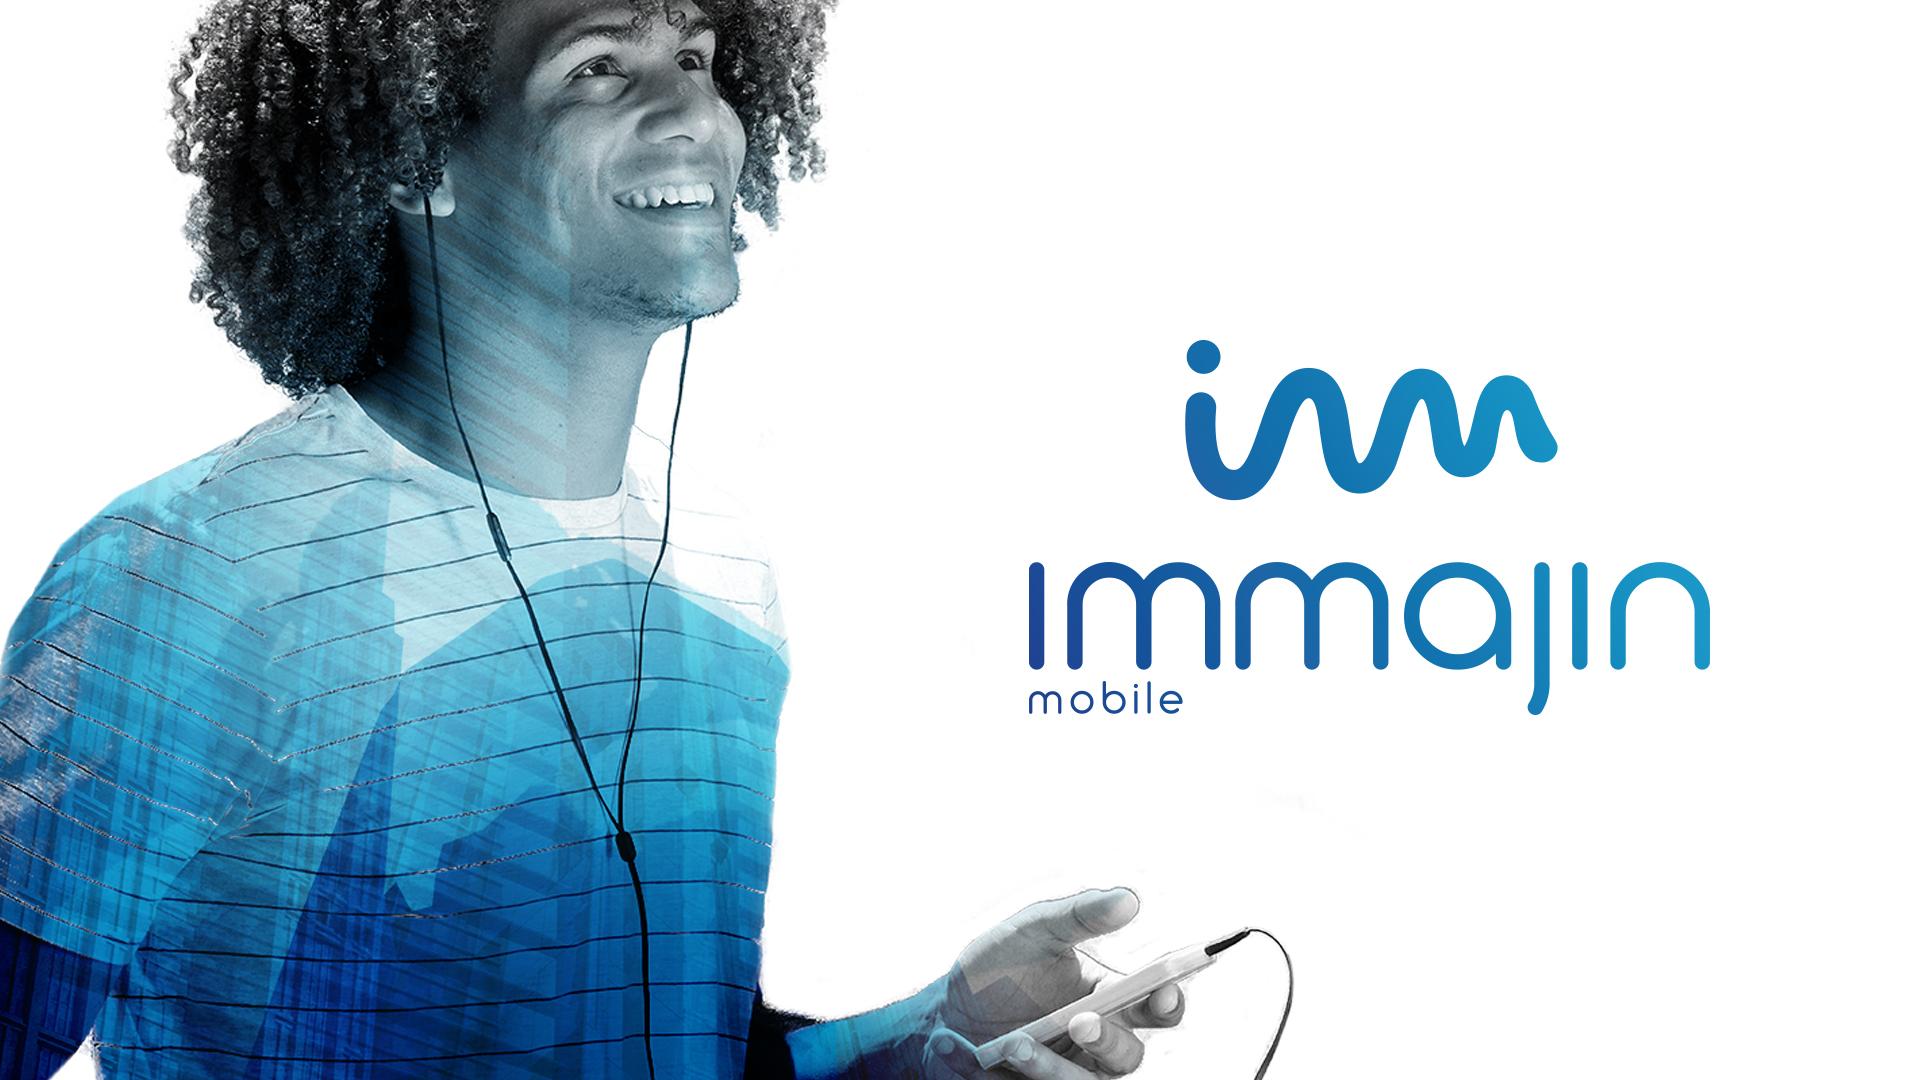 immajin-mobile-background-3